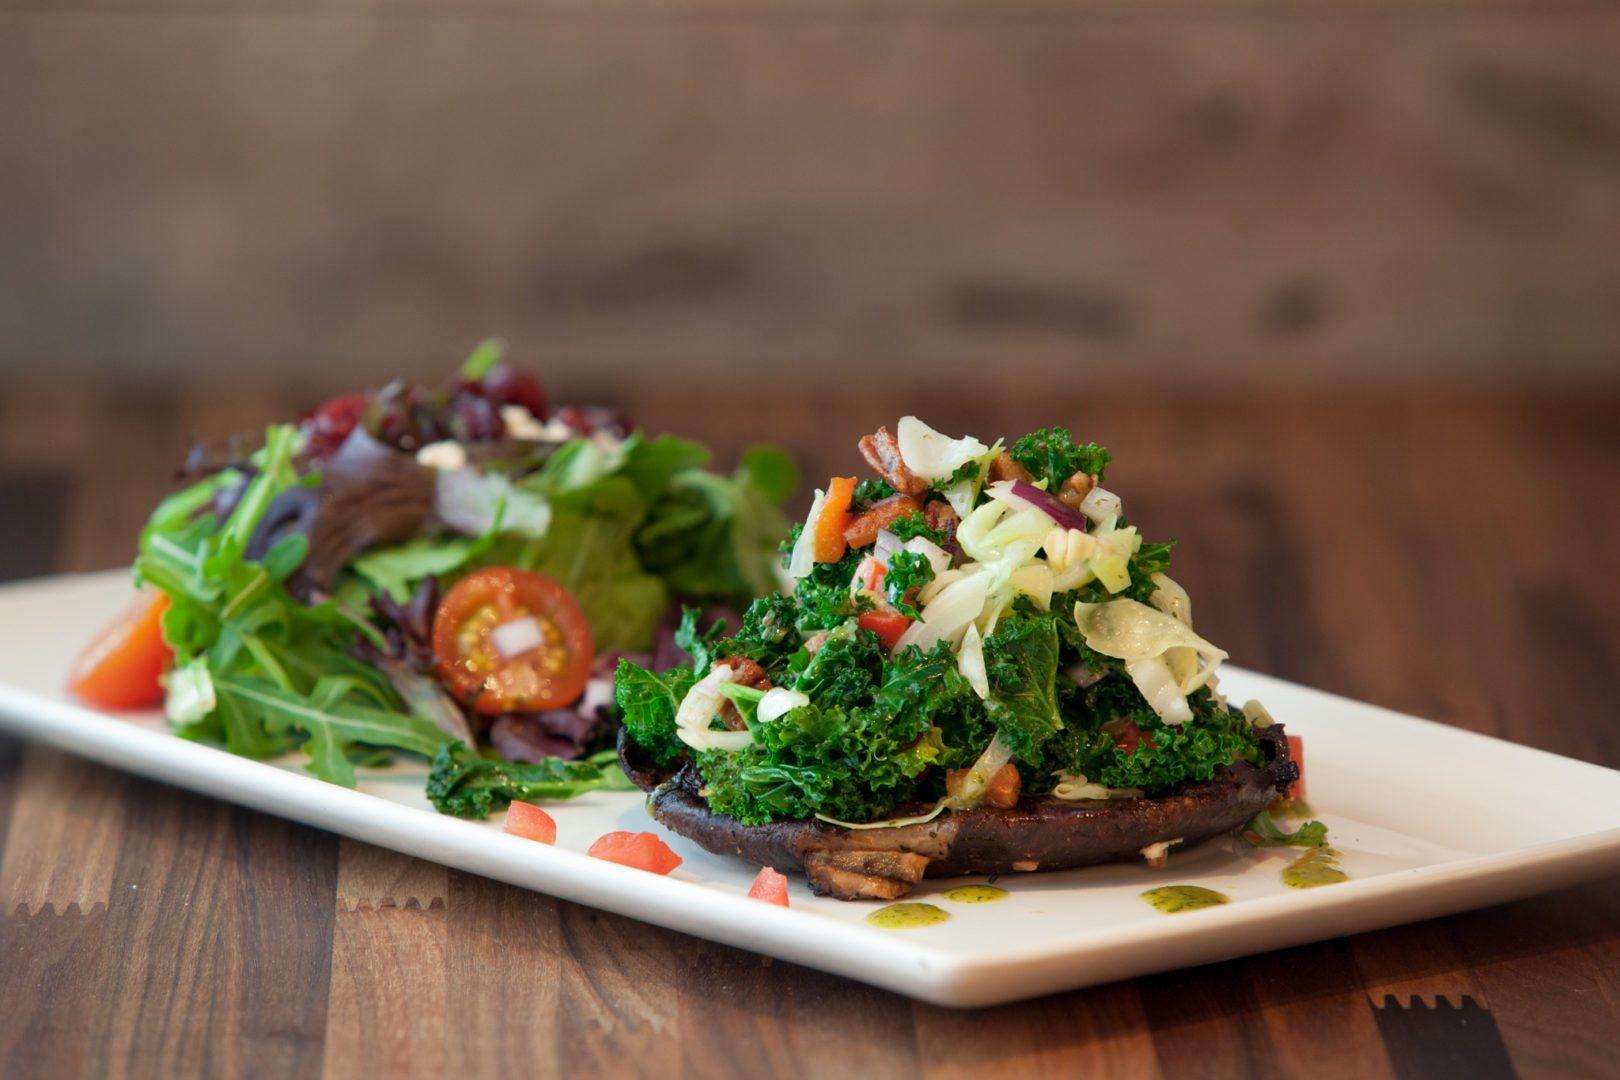 Coming Soon: Eureka! Restaurant in Irvine - Locale Magazine